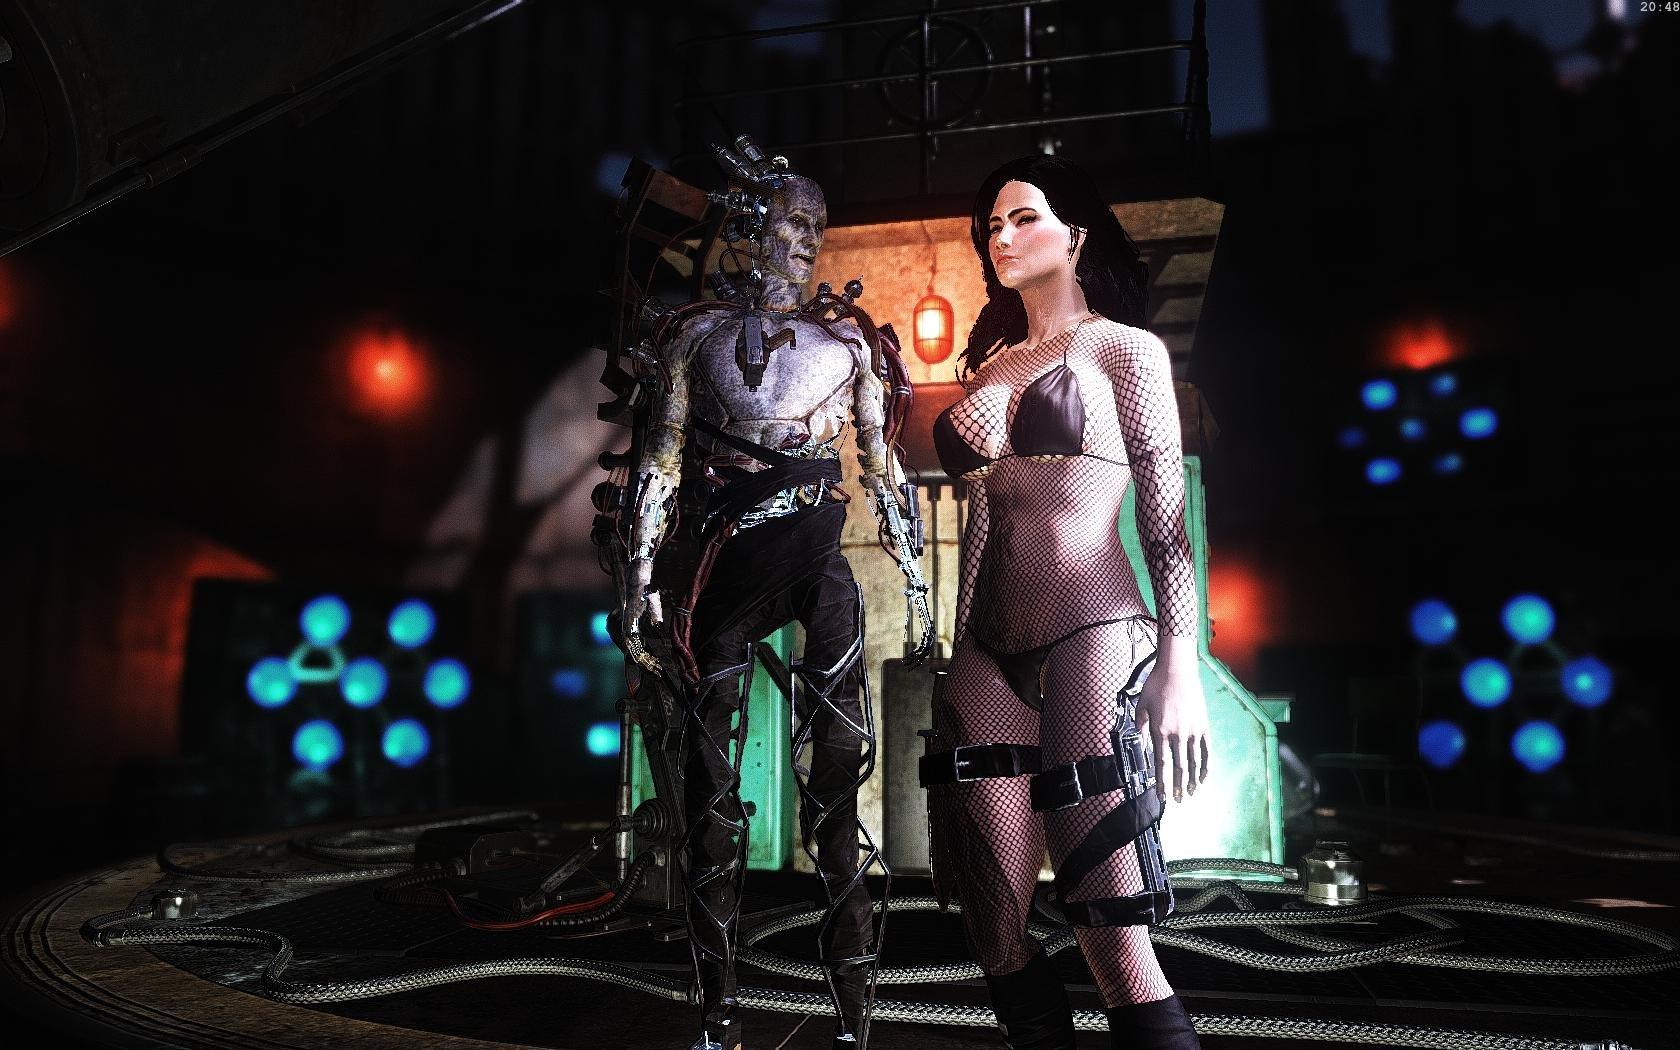 Fallout4 2019-05-30 20-48-00-80